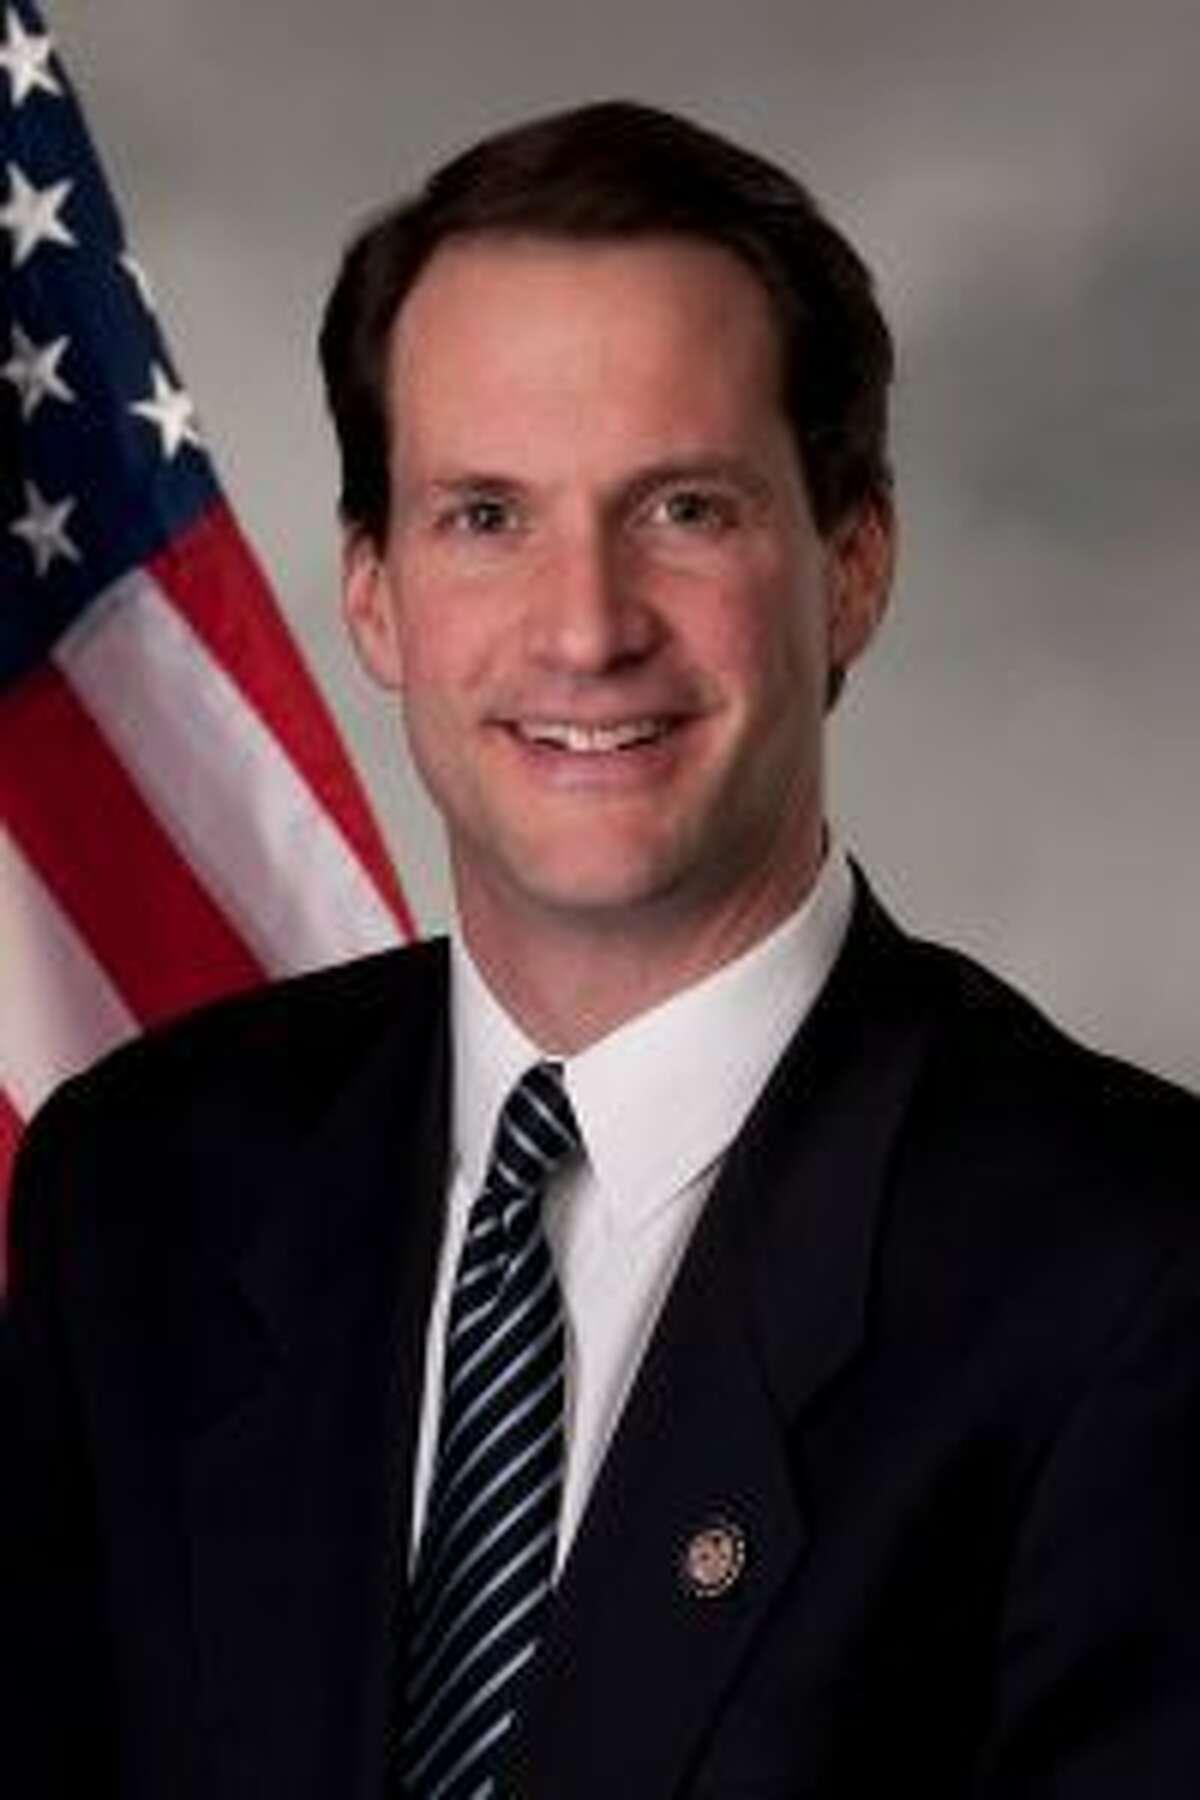 U.S. Congressman Jim Himes